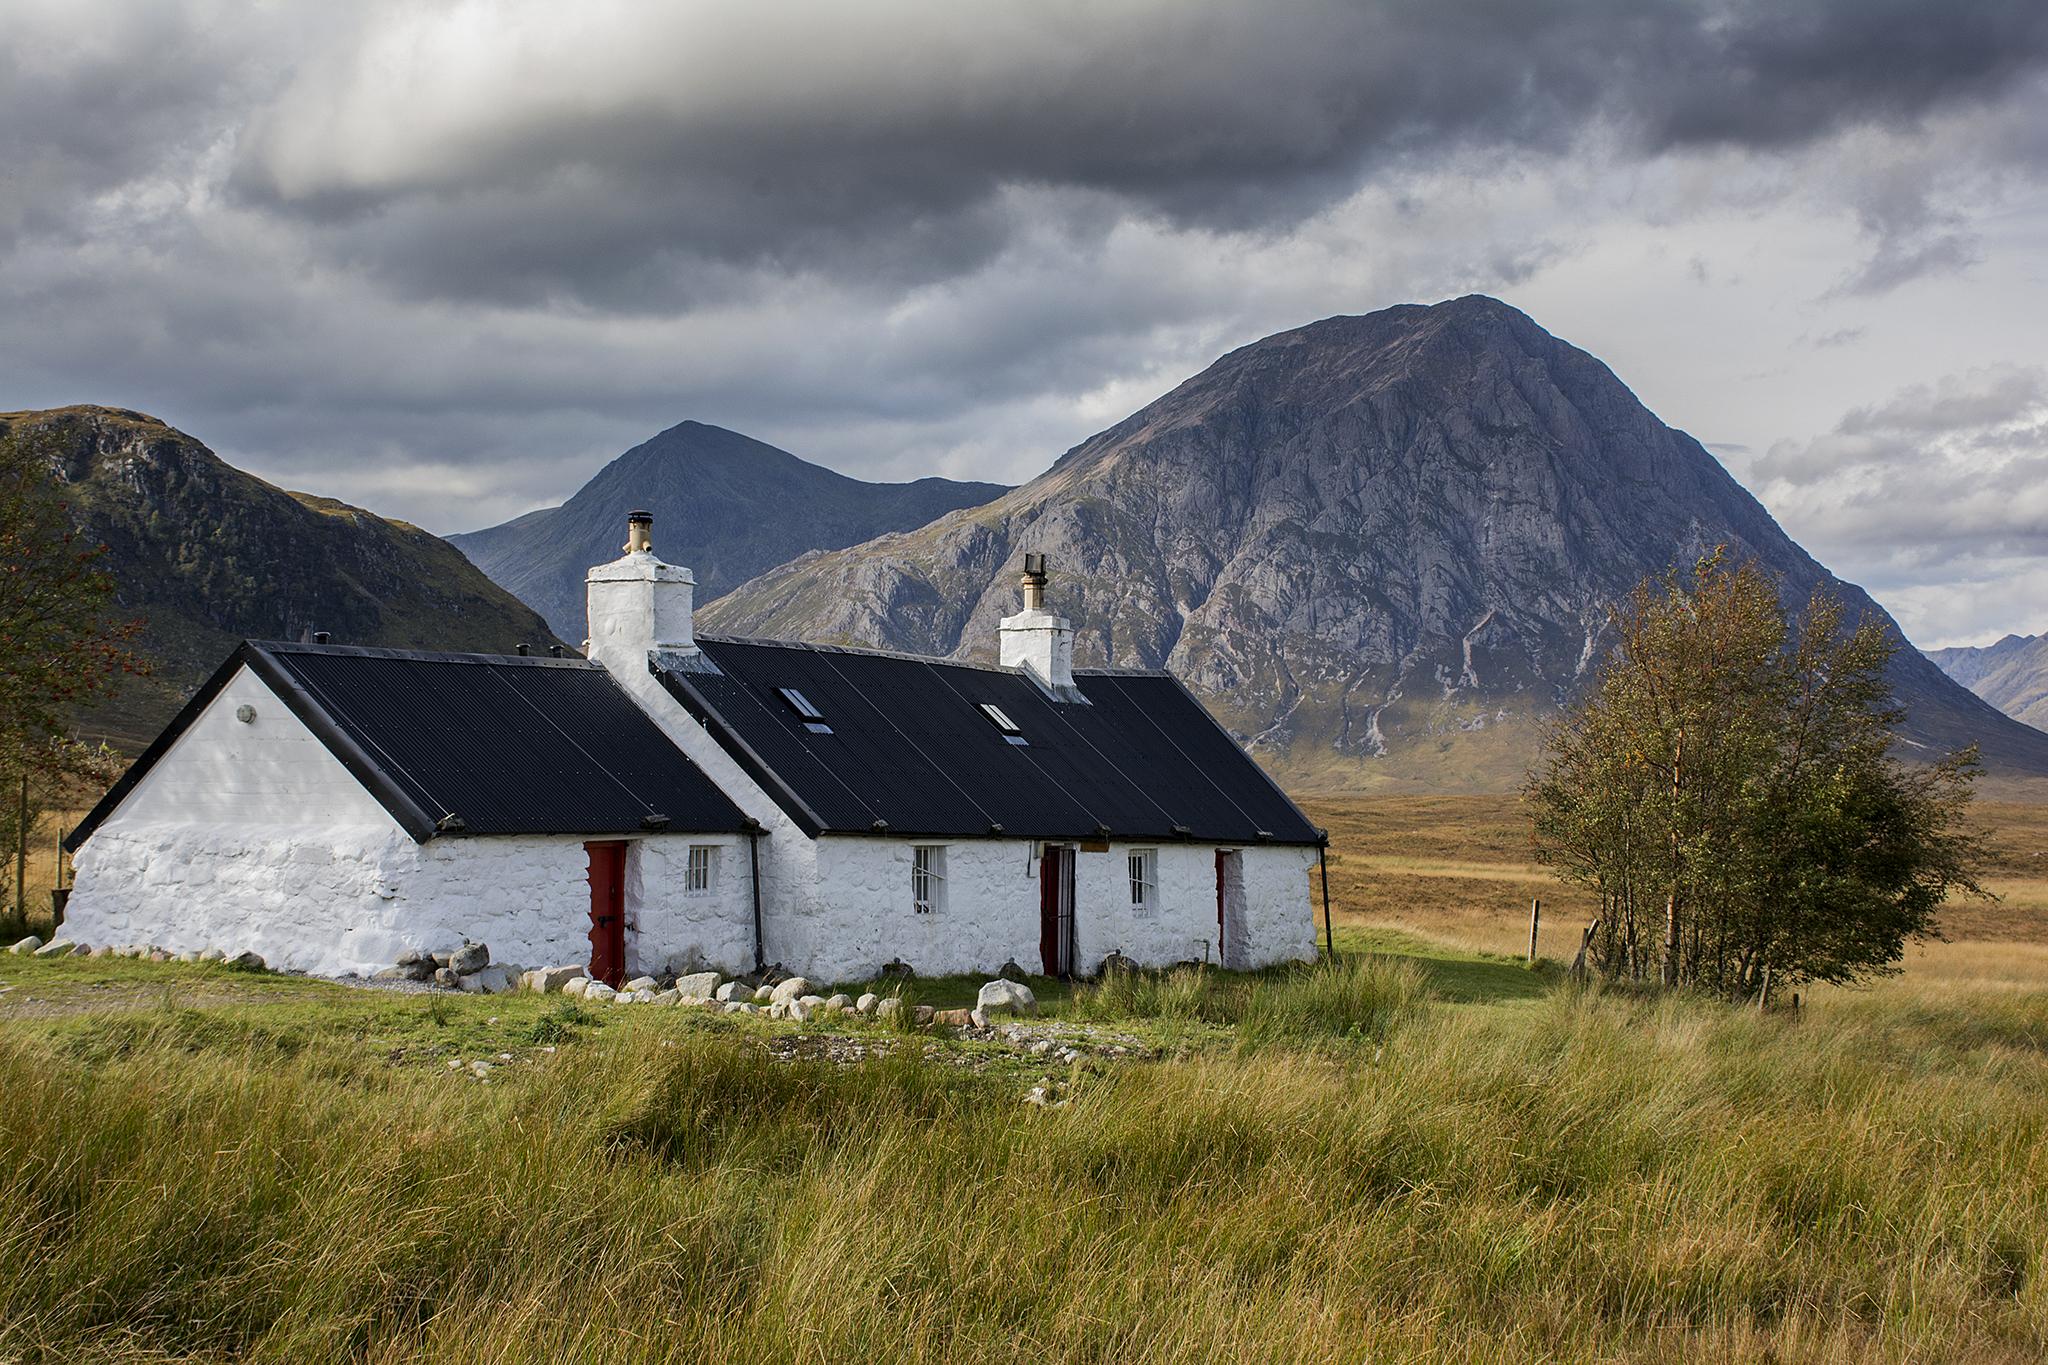 Black Rock Cottage, Scotland, United Kingdom